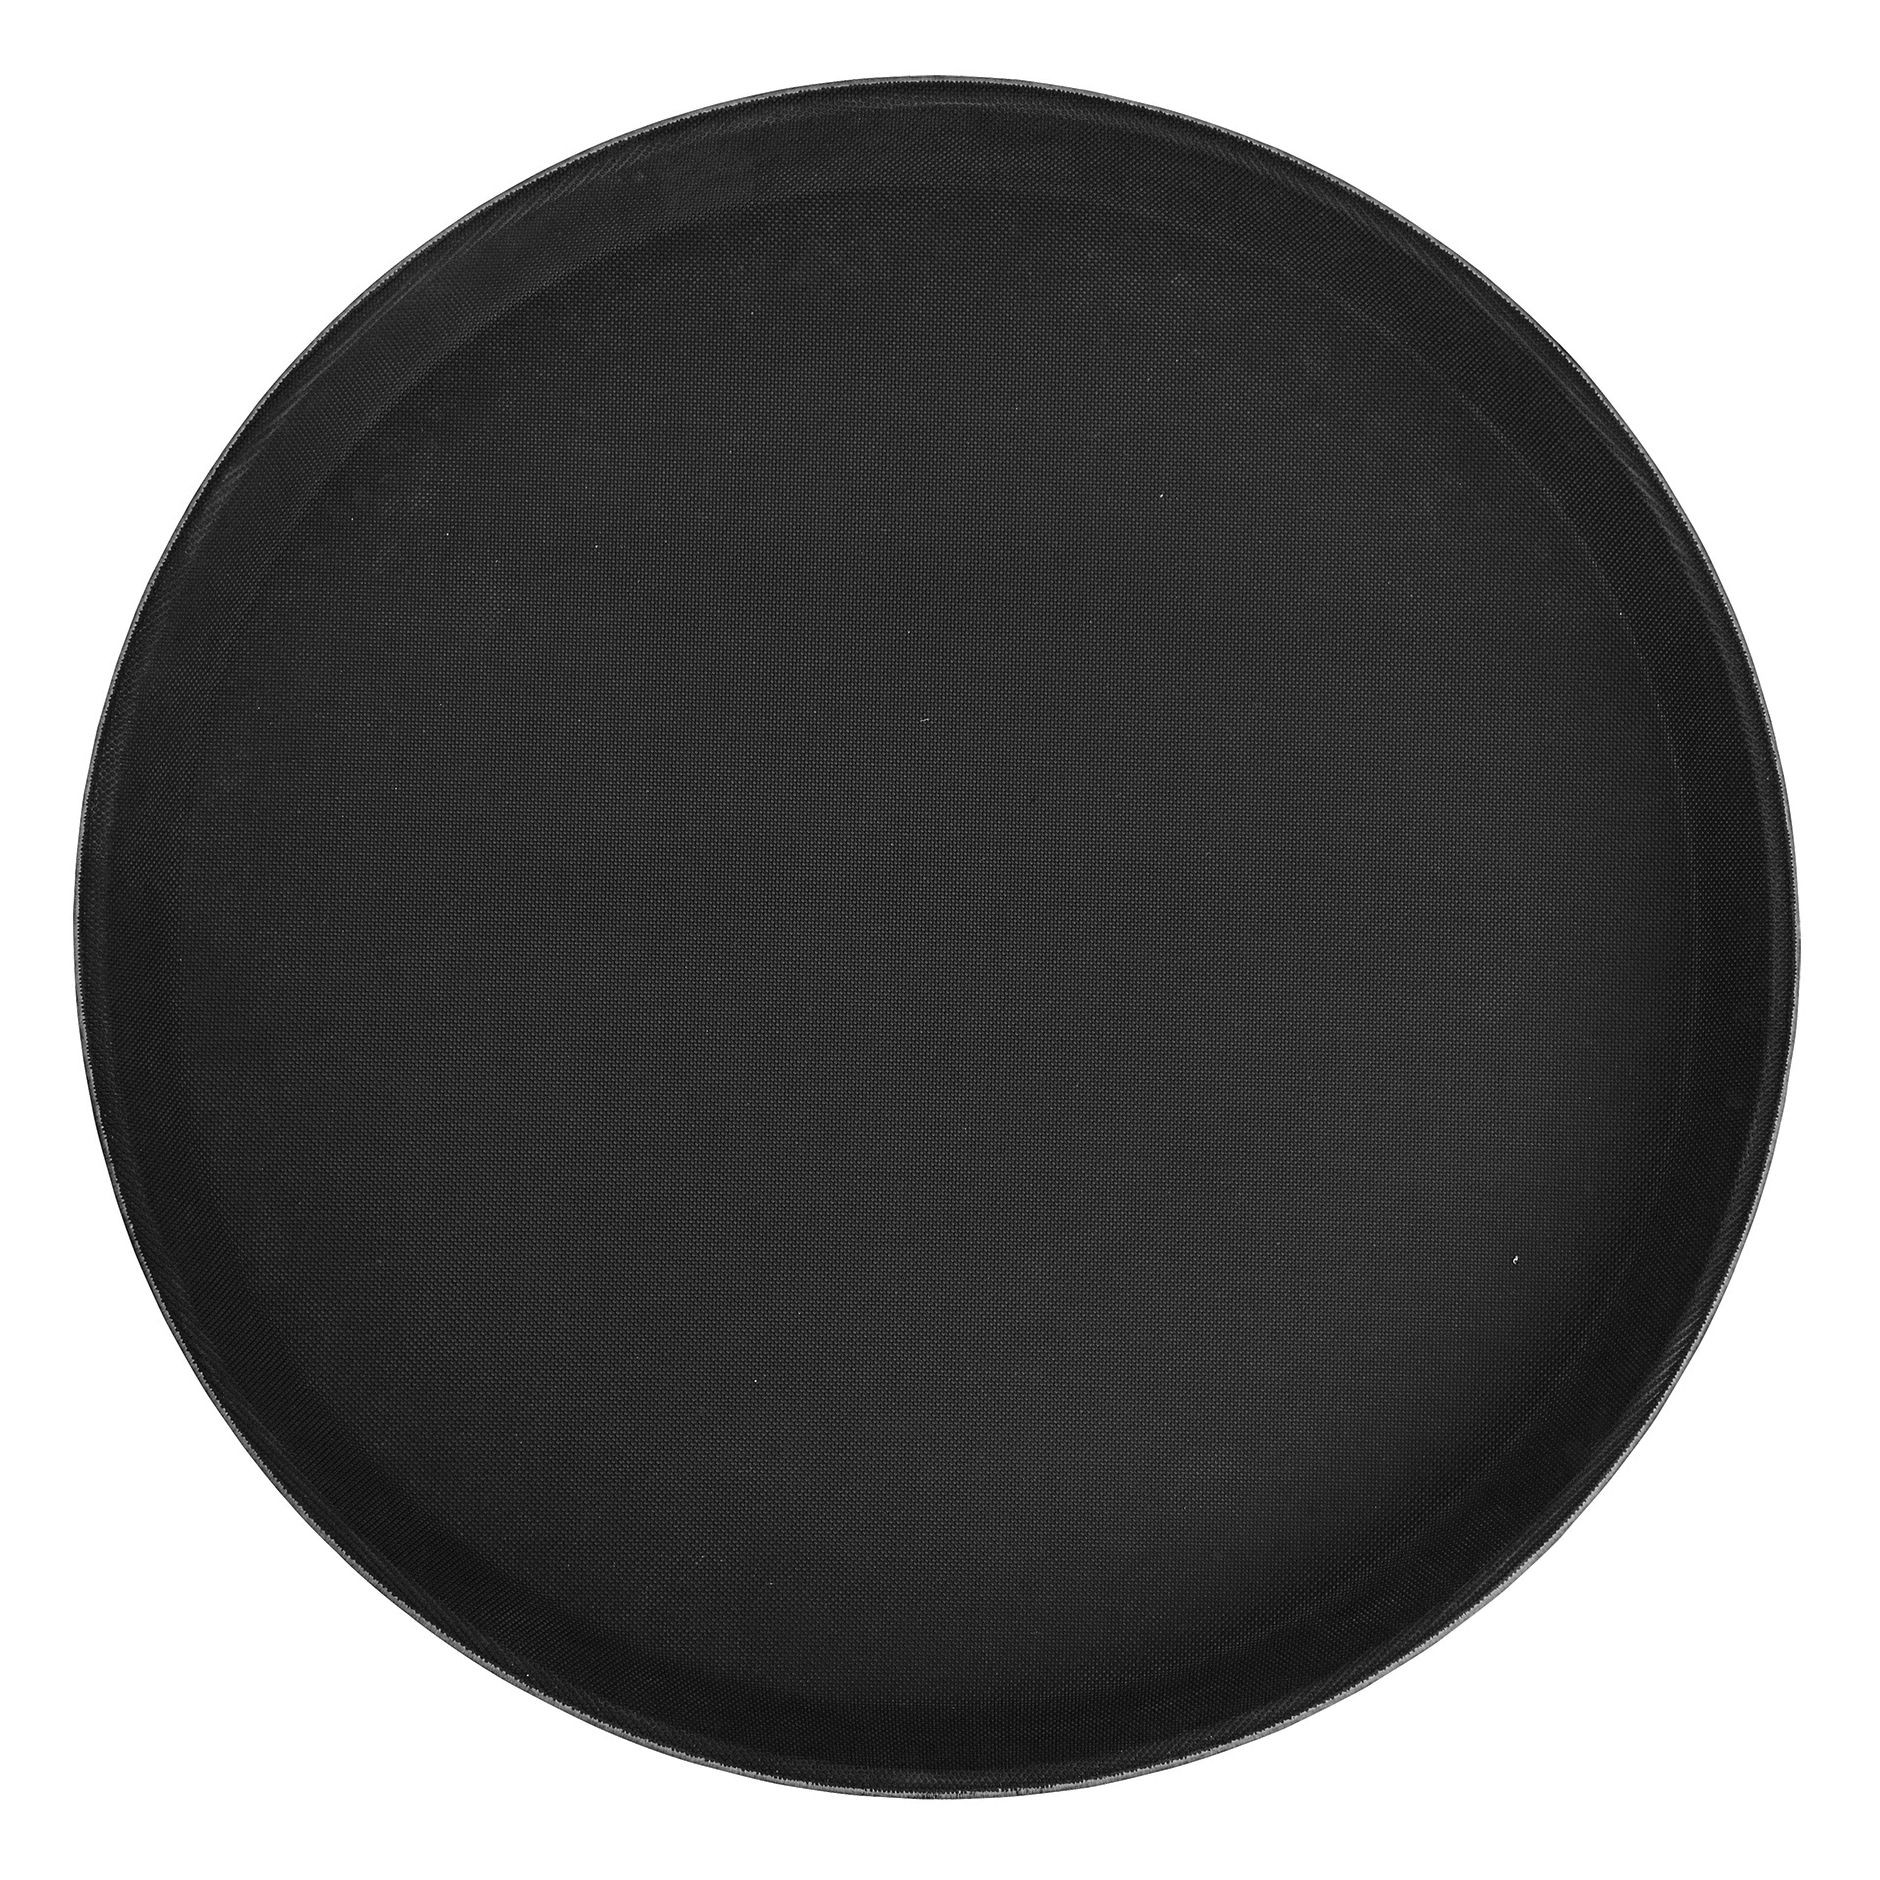 Non-Slip Fiberglass Tray Black, 16'' Round